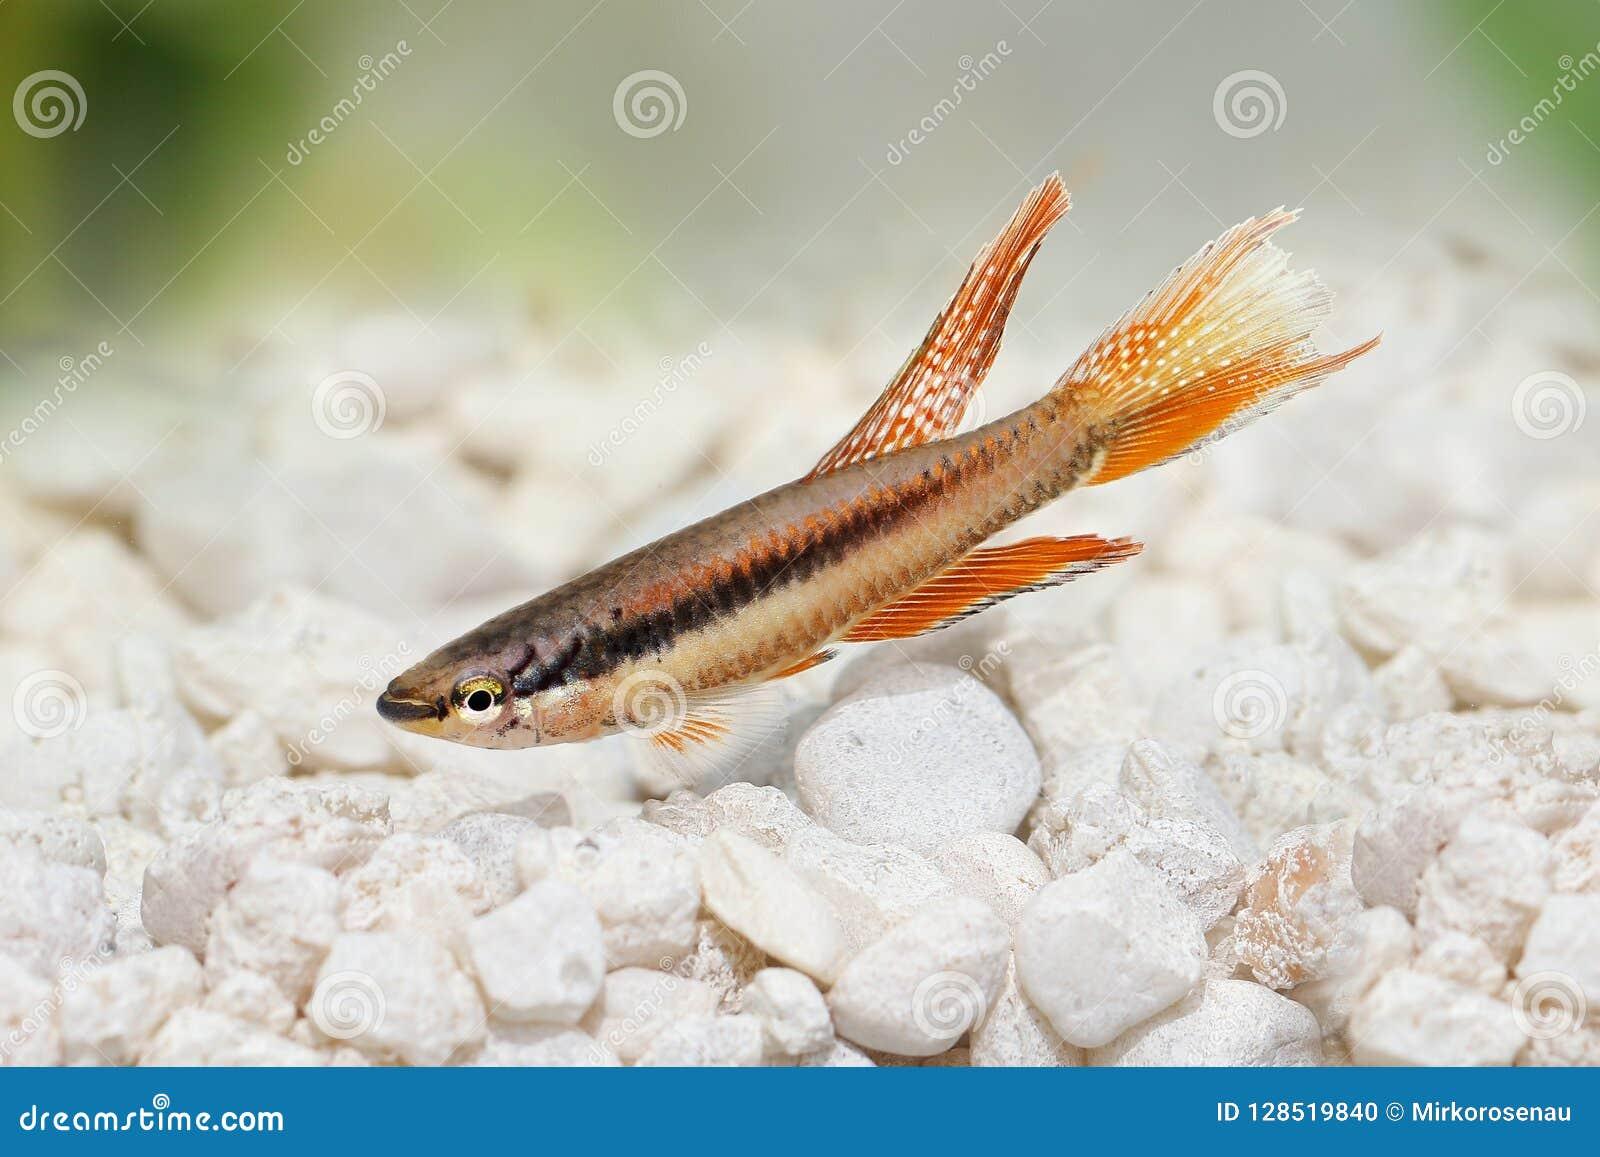 拉各斯红色锵鱼水族馆鱼Killi Aphyosemion bitaeniatum